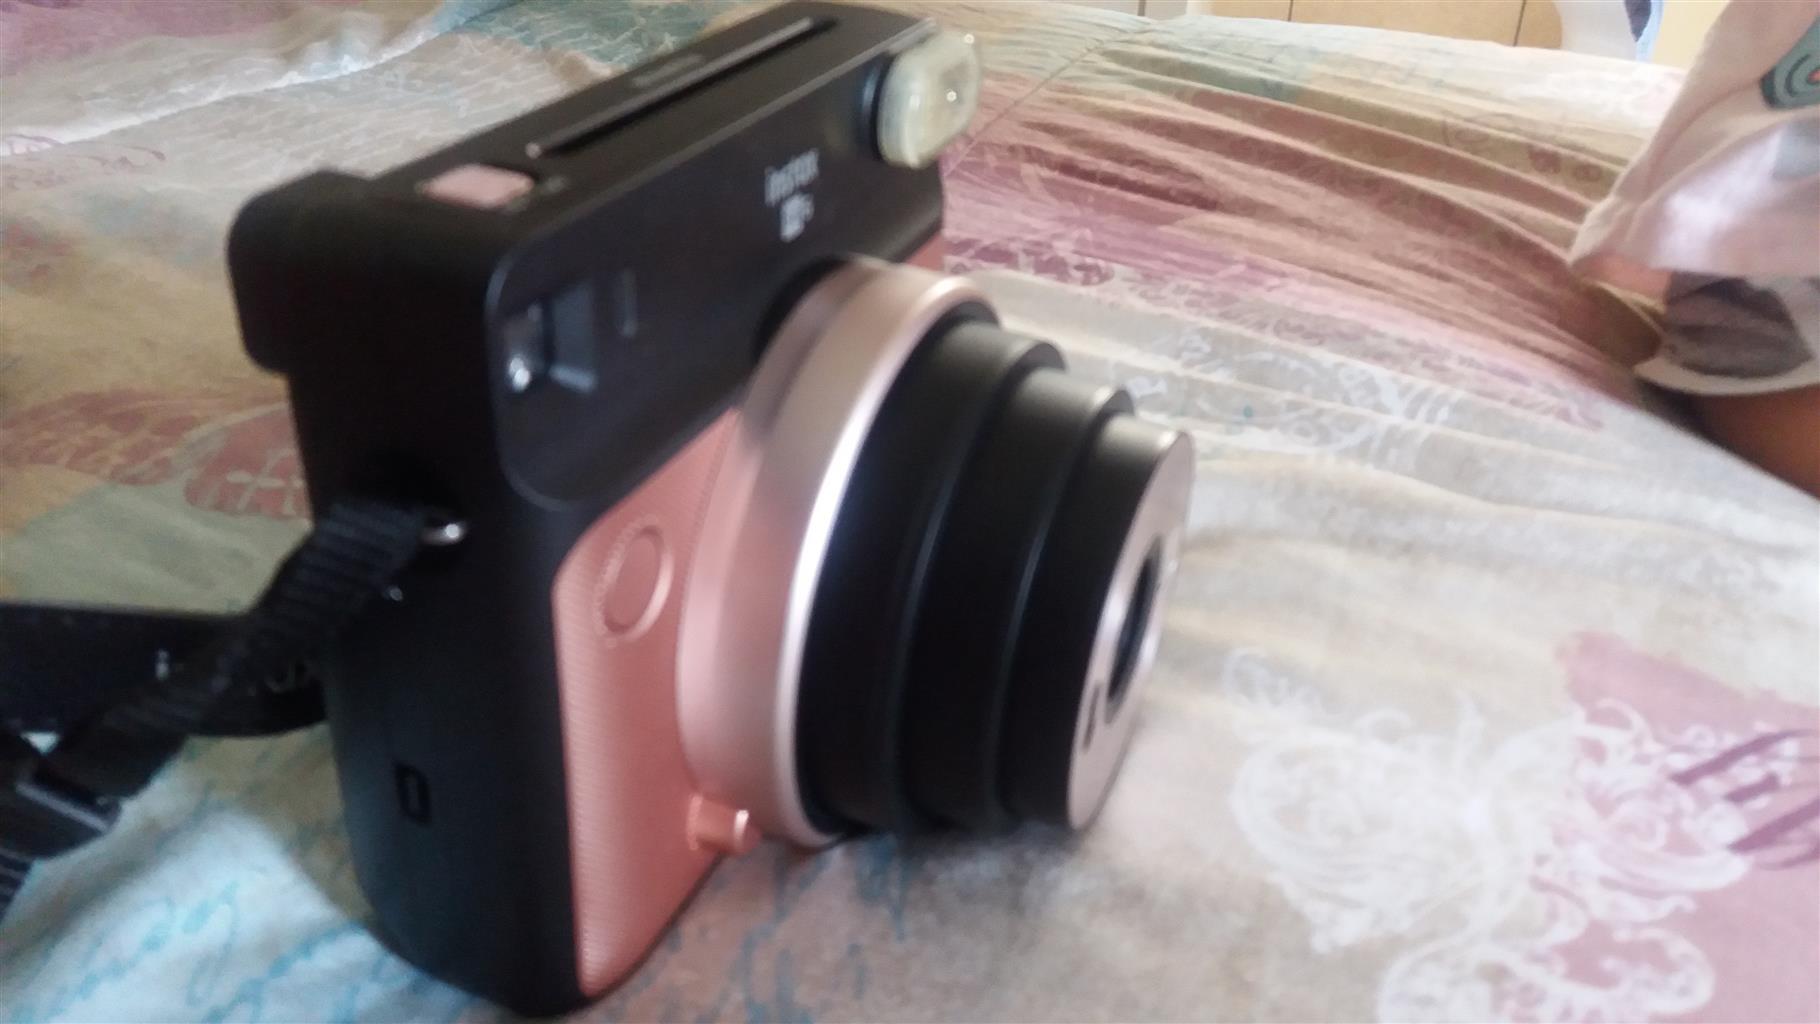 Instant camera INSTAX SQUARE